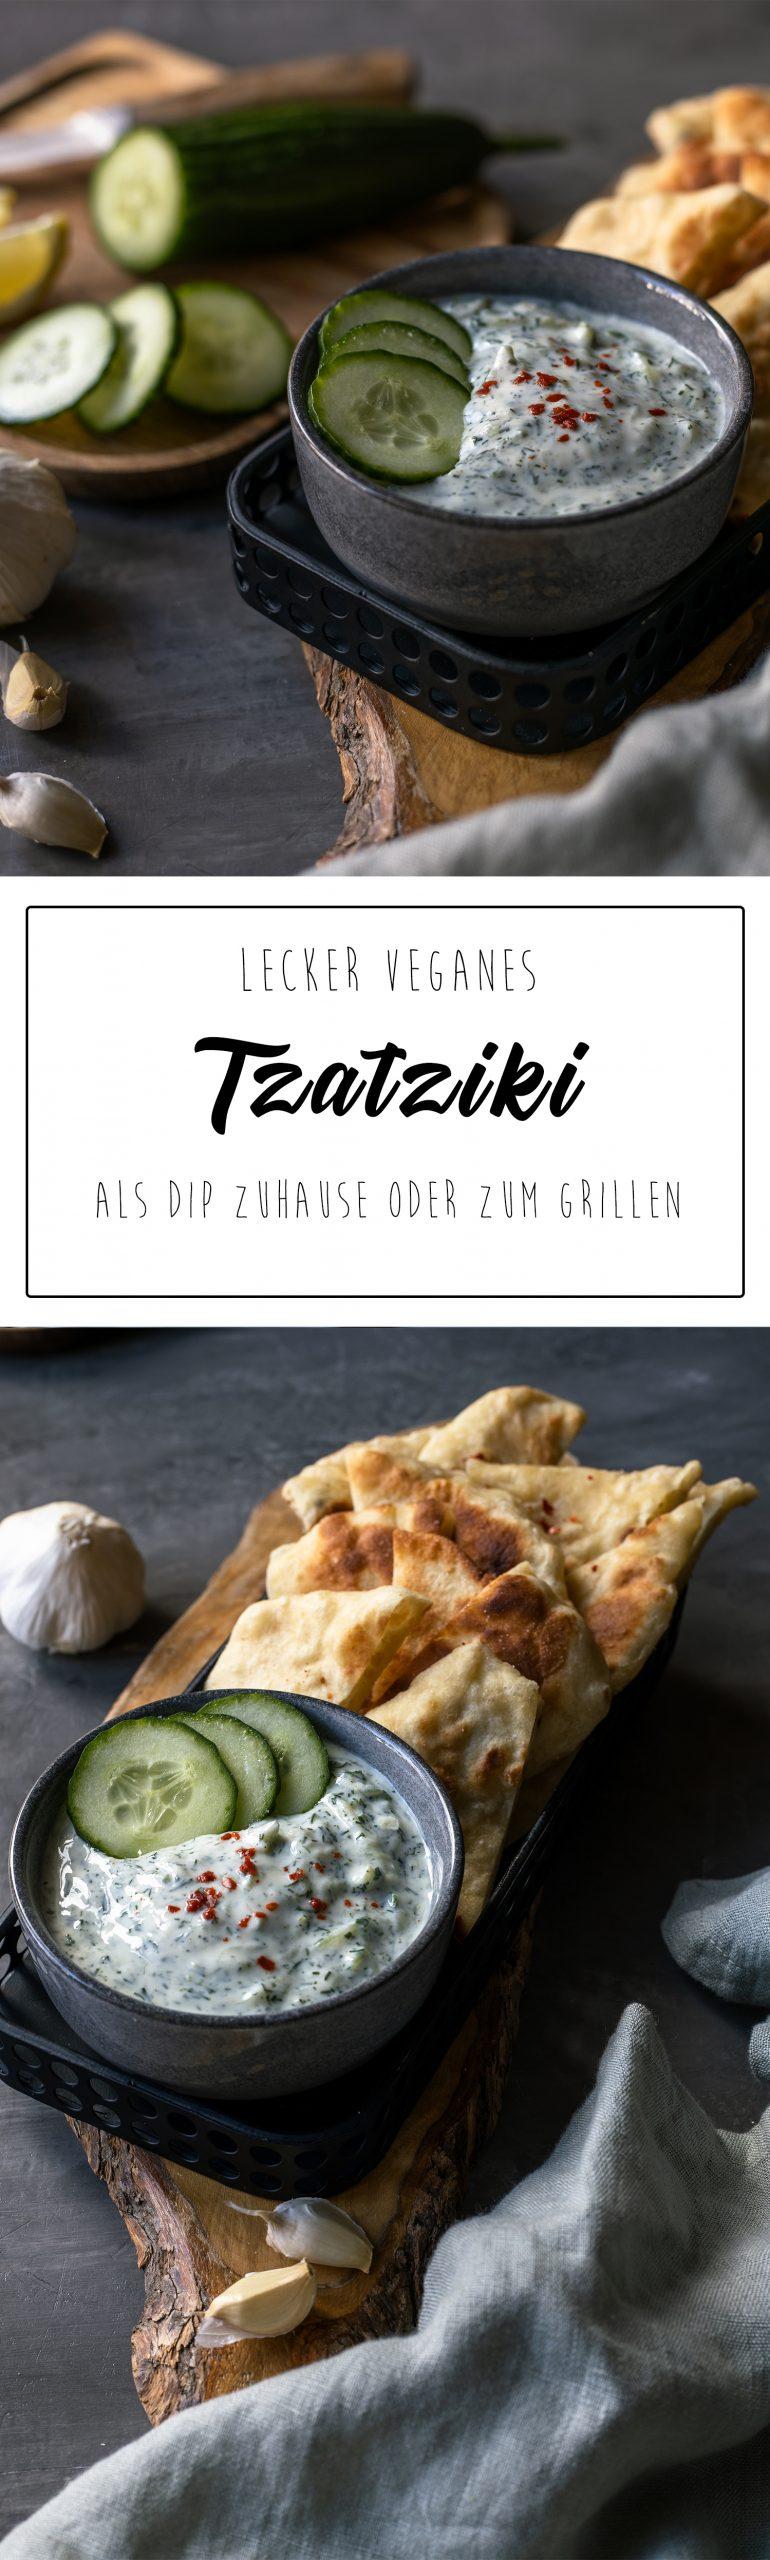 Tzatziki vegan Pinterest